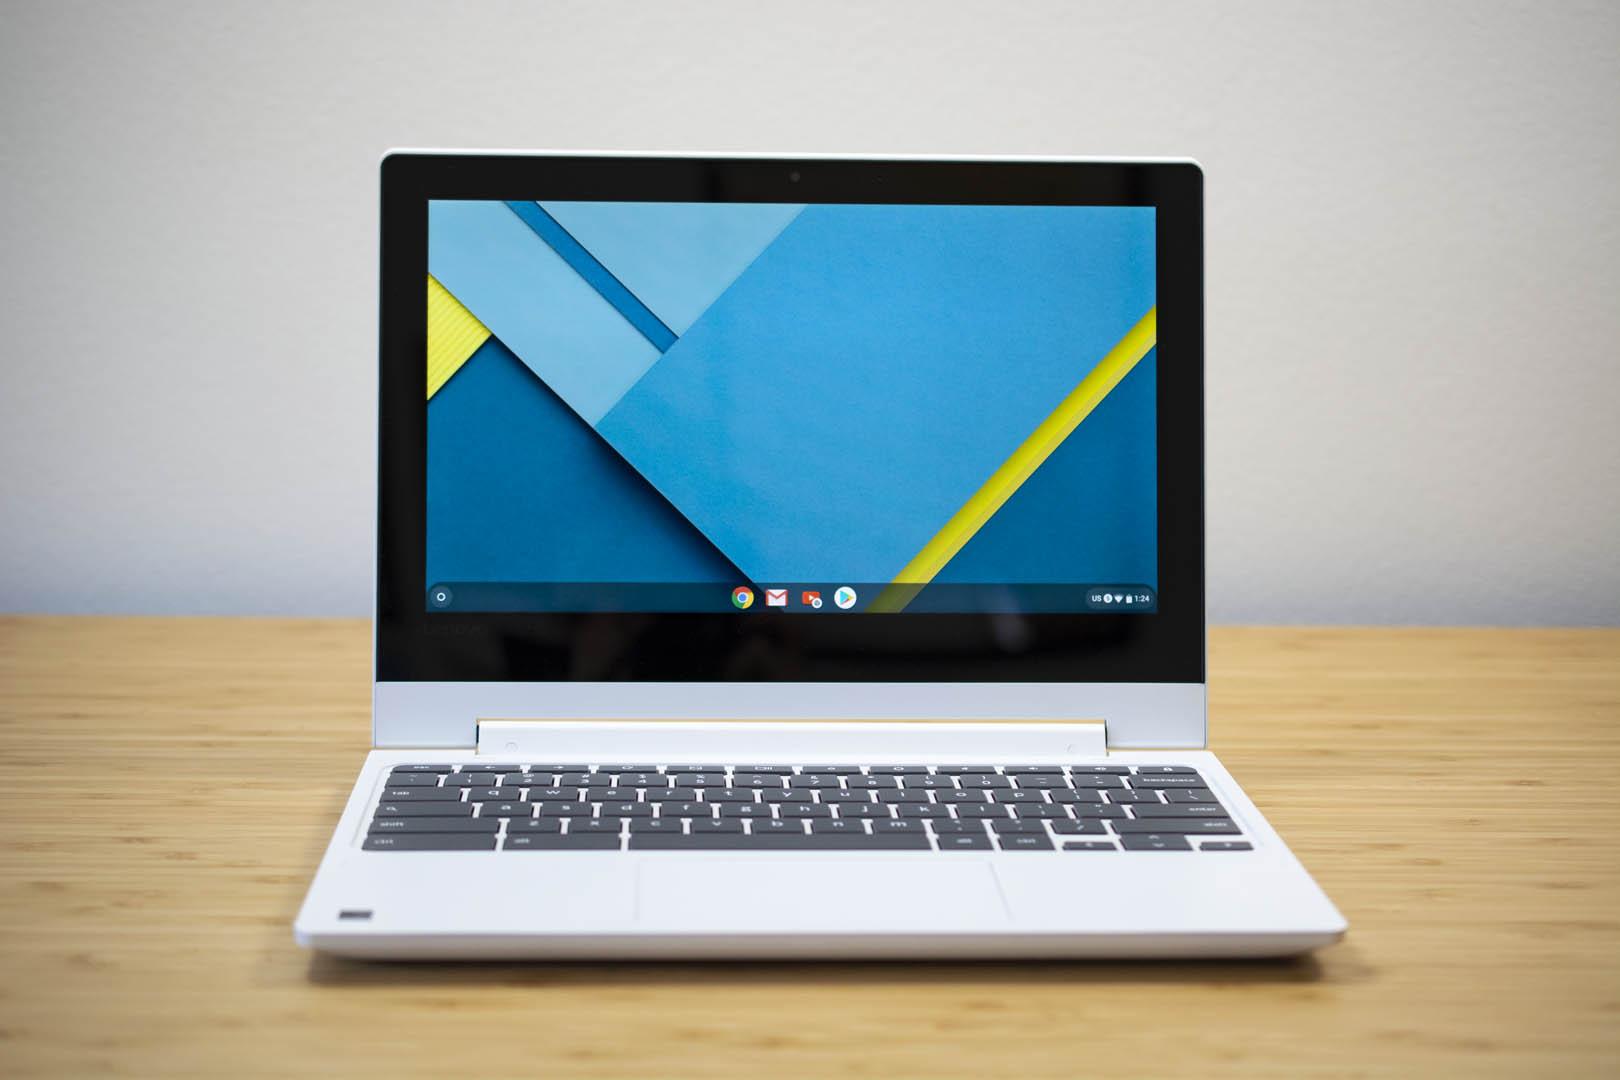 The Lenovo Chromebook C330.